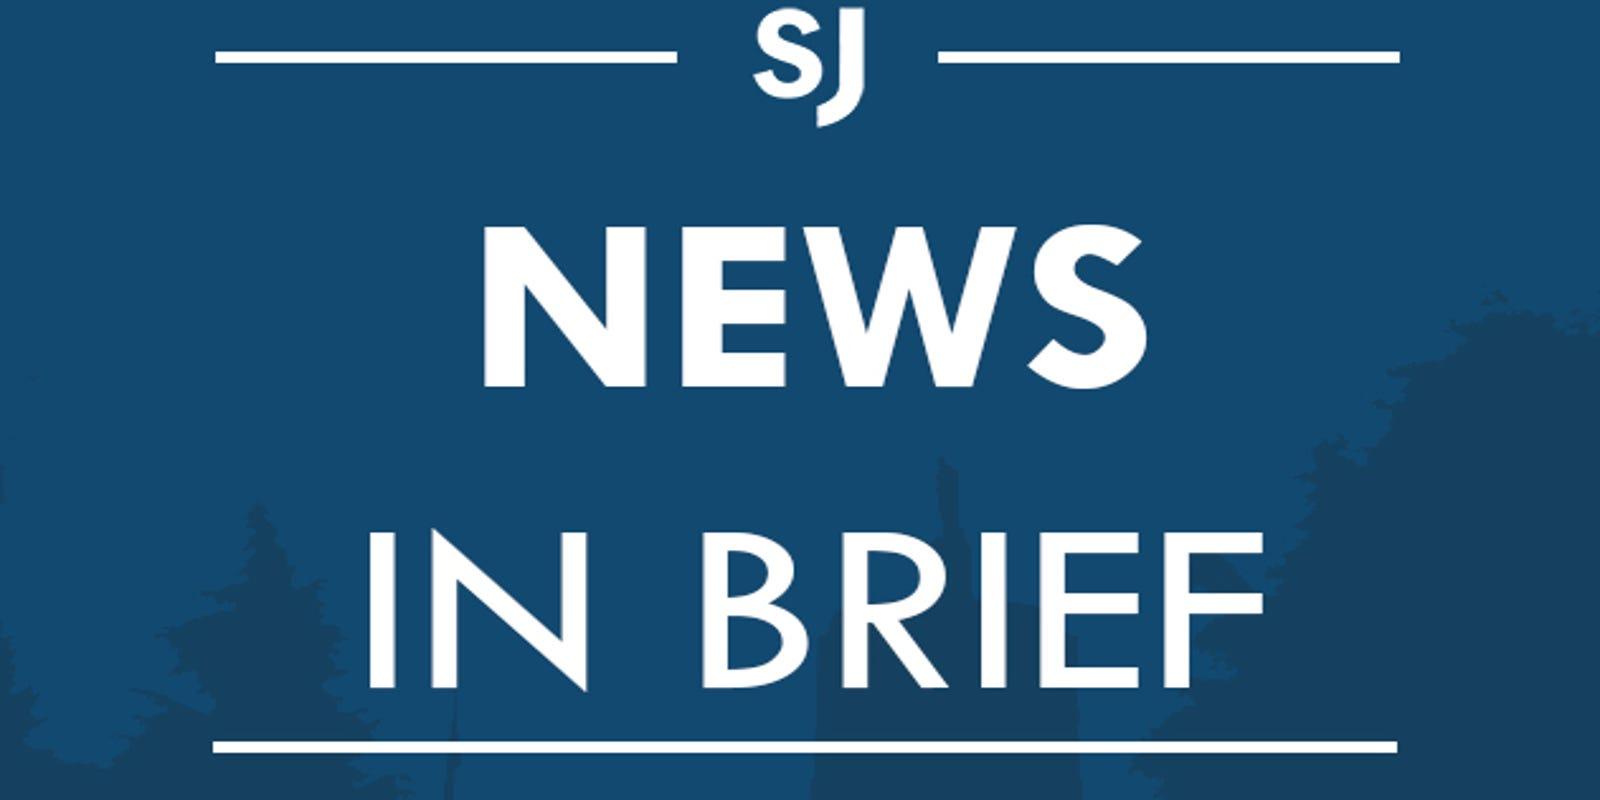 Motorcyclist injured, taken to hospital after Silverton Road NE crash